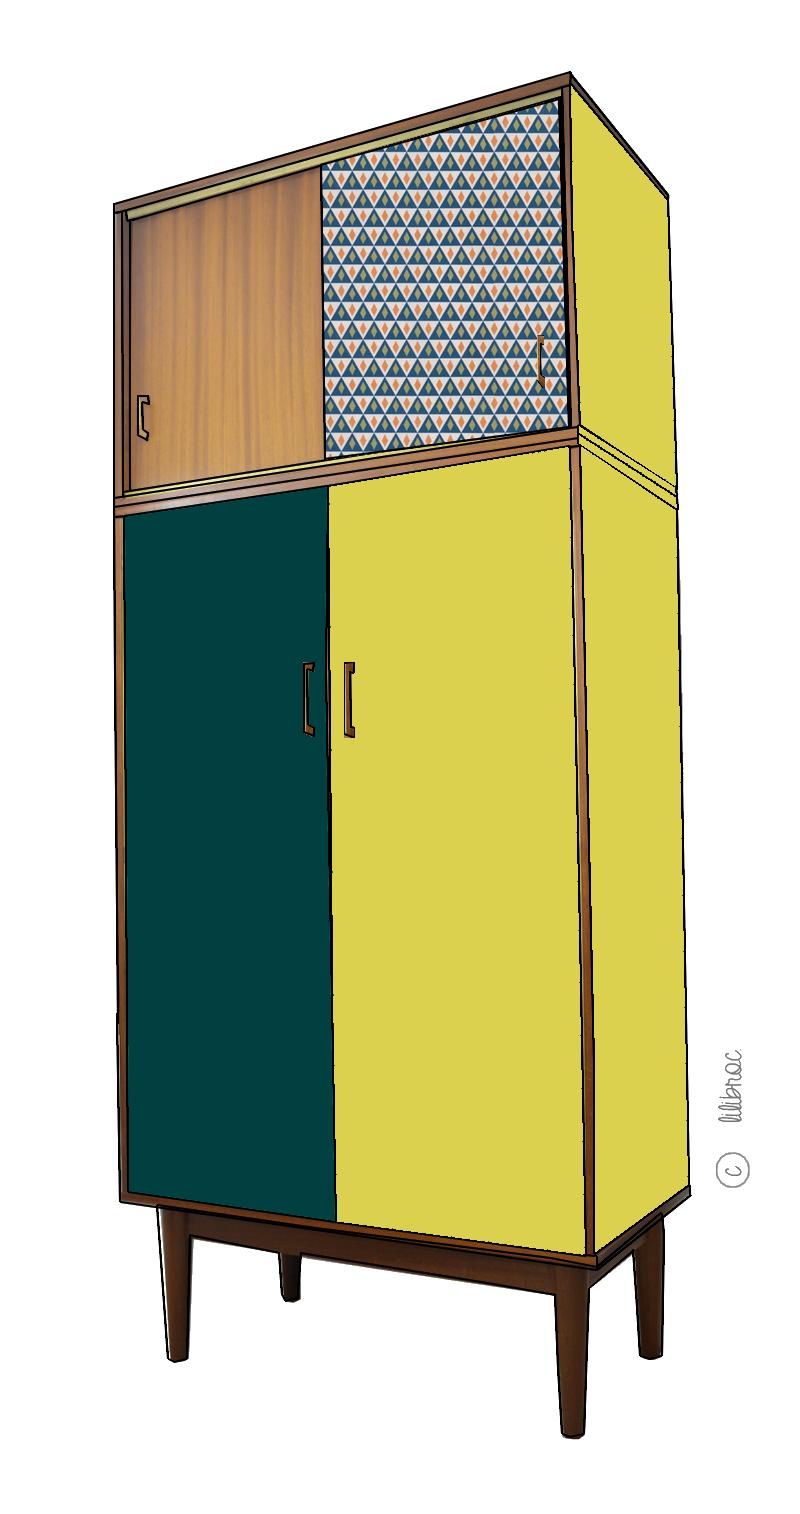 armoire-vintage-philomene-croquis-3